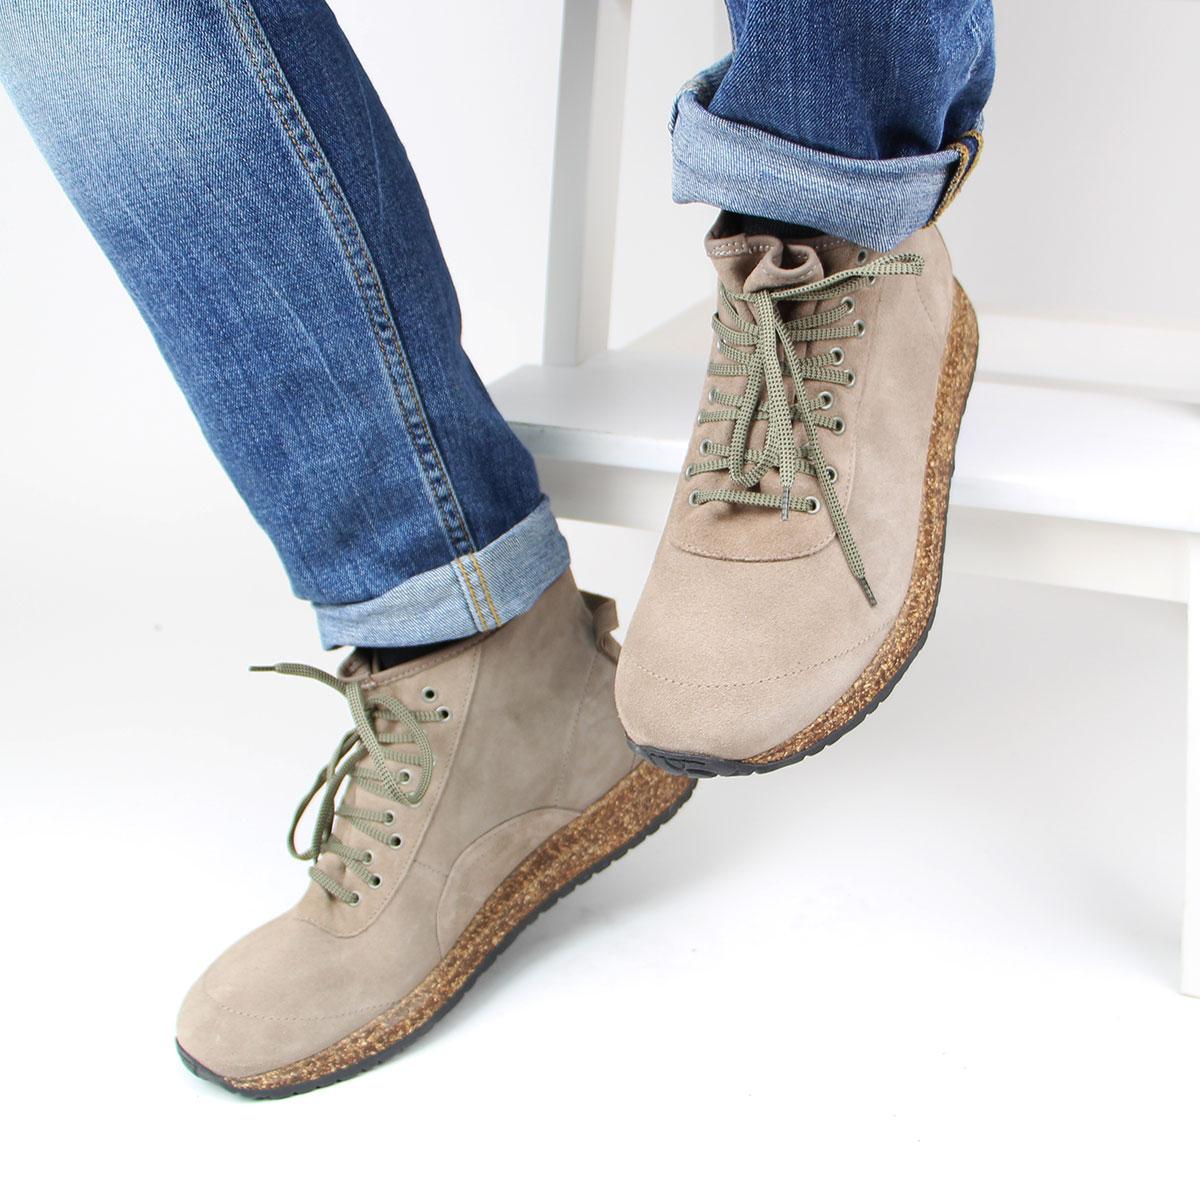 df412bbcaa4 Kožené hnědé kotníkové boty Atlin LEVE – 43